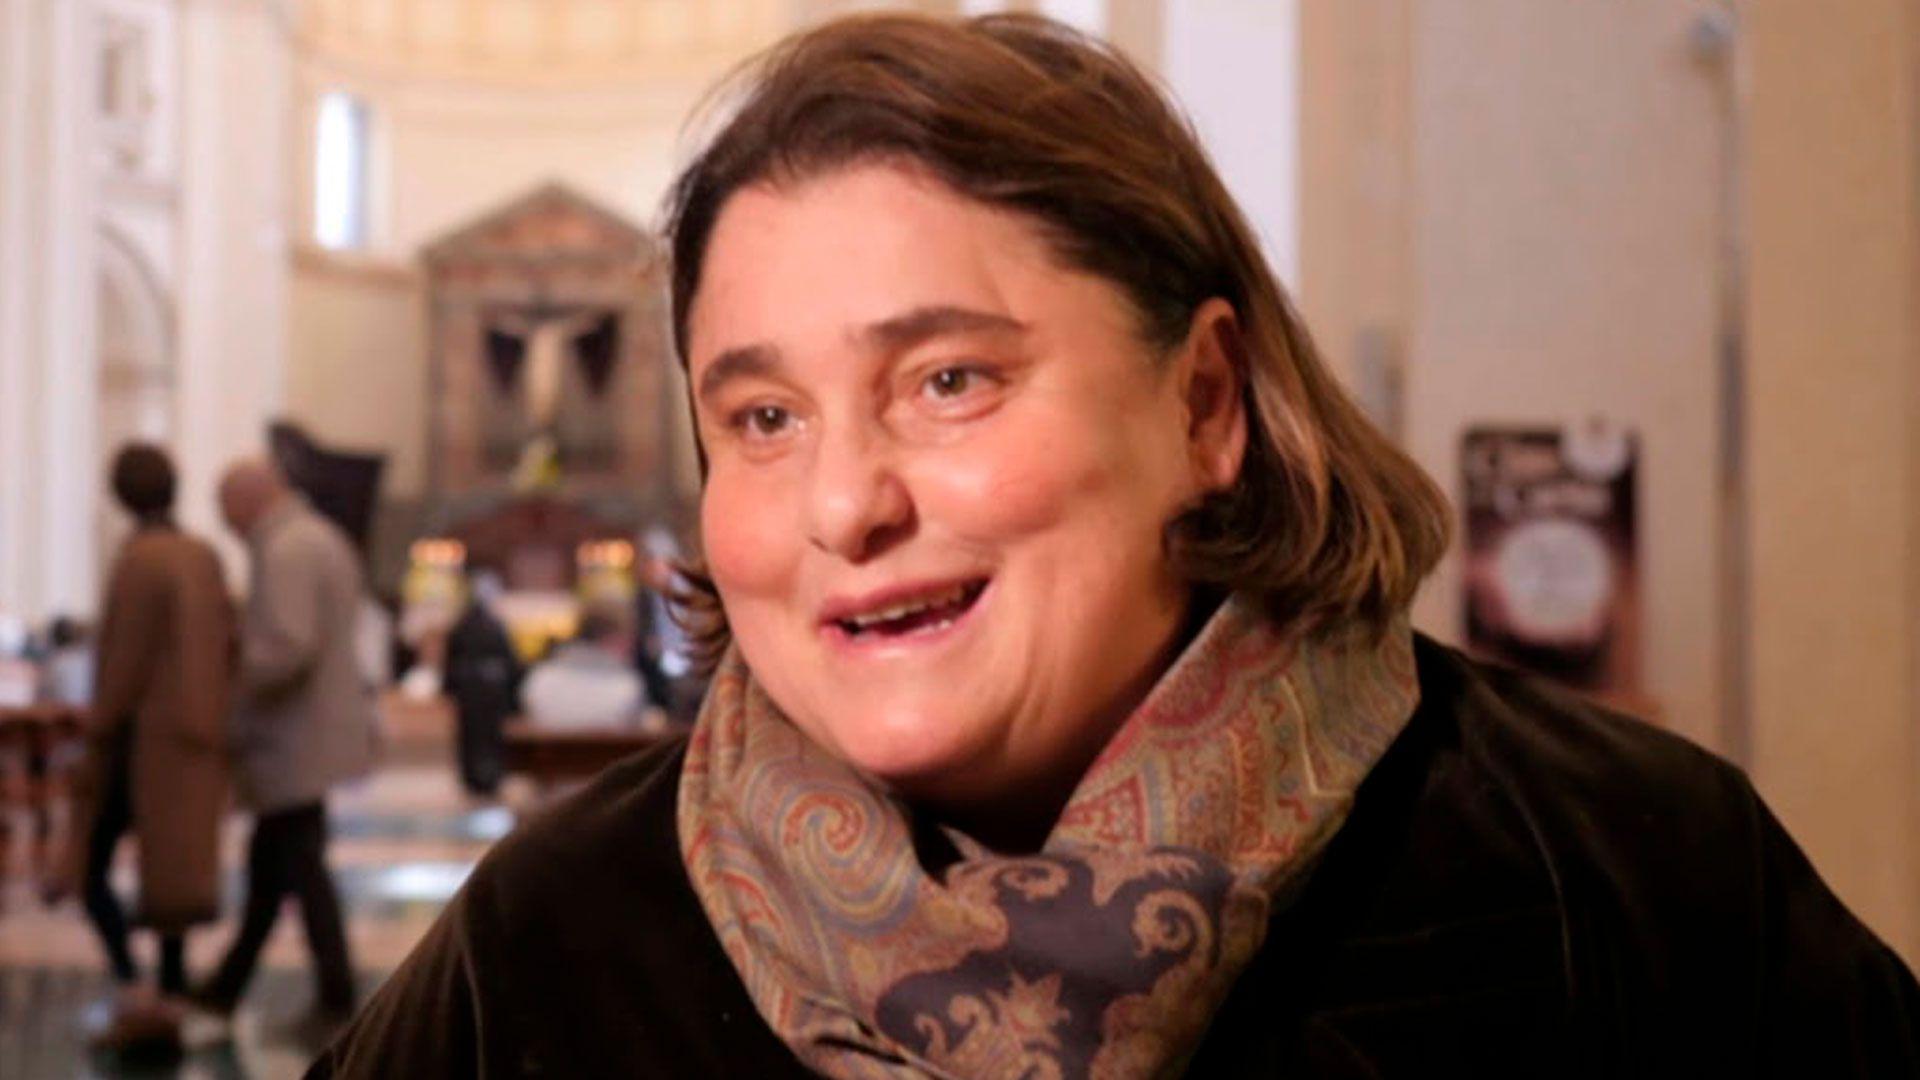 Antonia-Salzano-madre-de-Carlo-Acutis